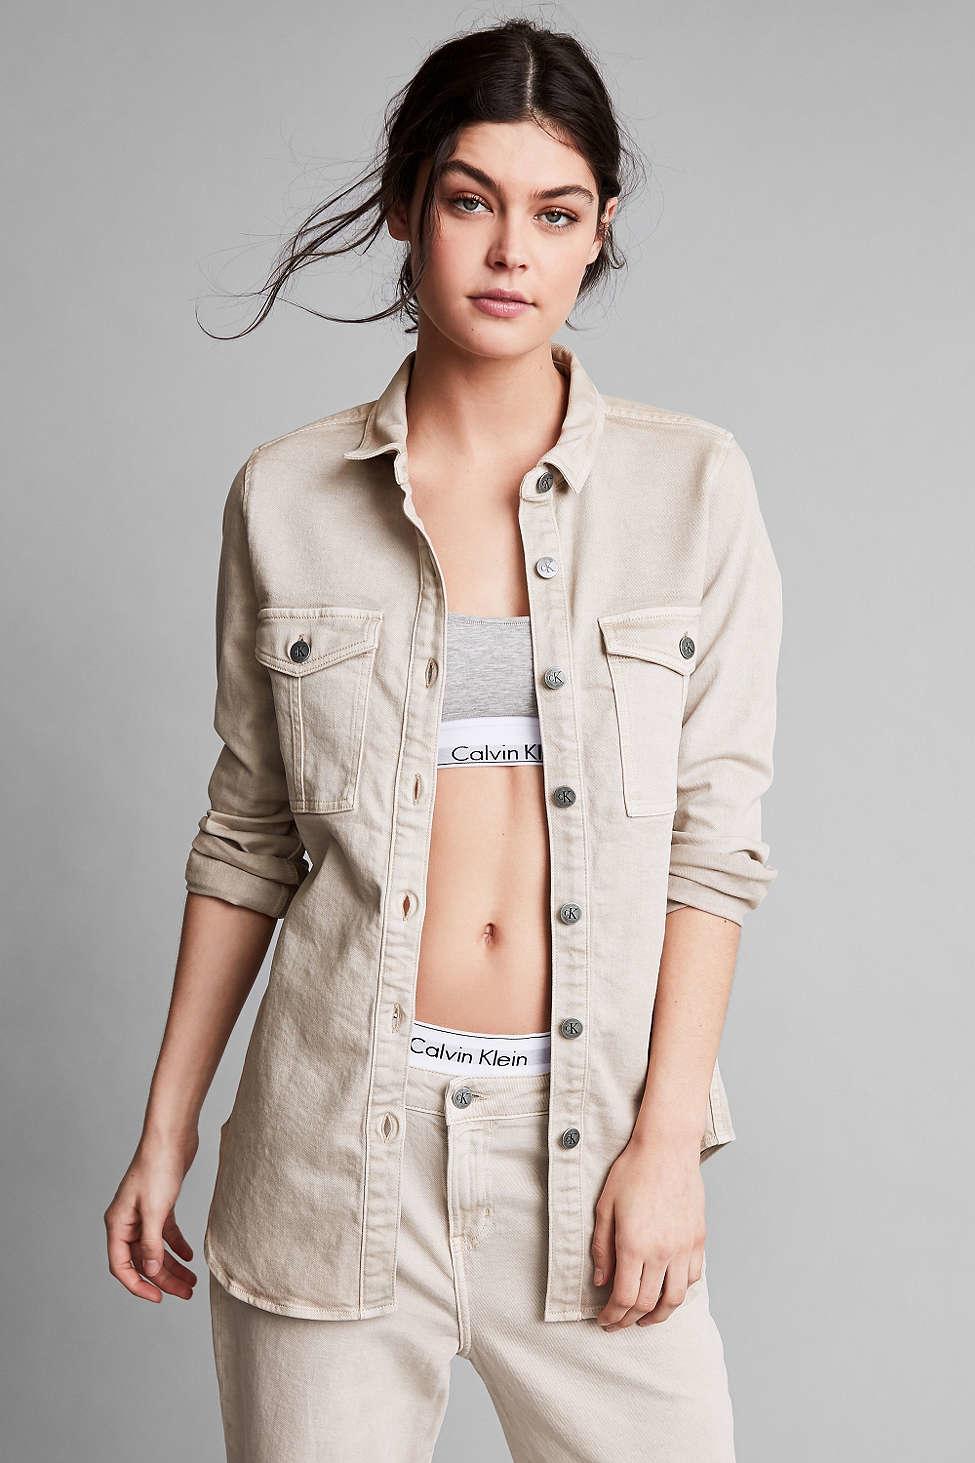 409a9cbe374 Lyst - Calvin Klein For Uo Khaki Button-down Utility Shirt in Natural